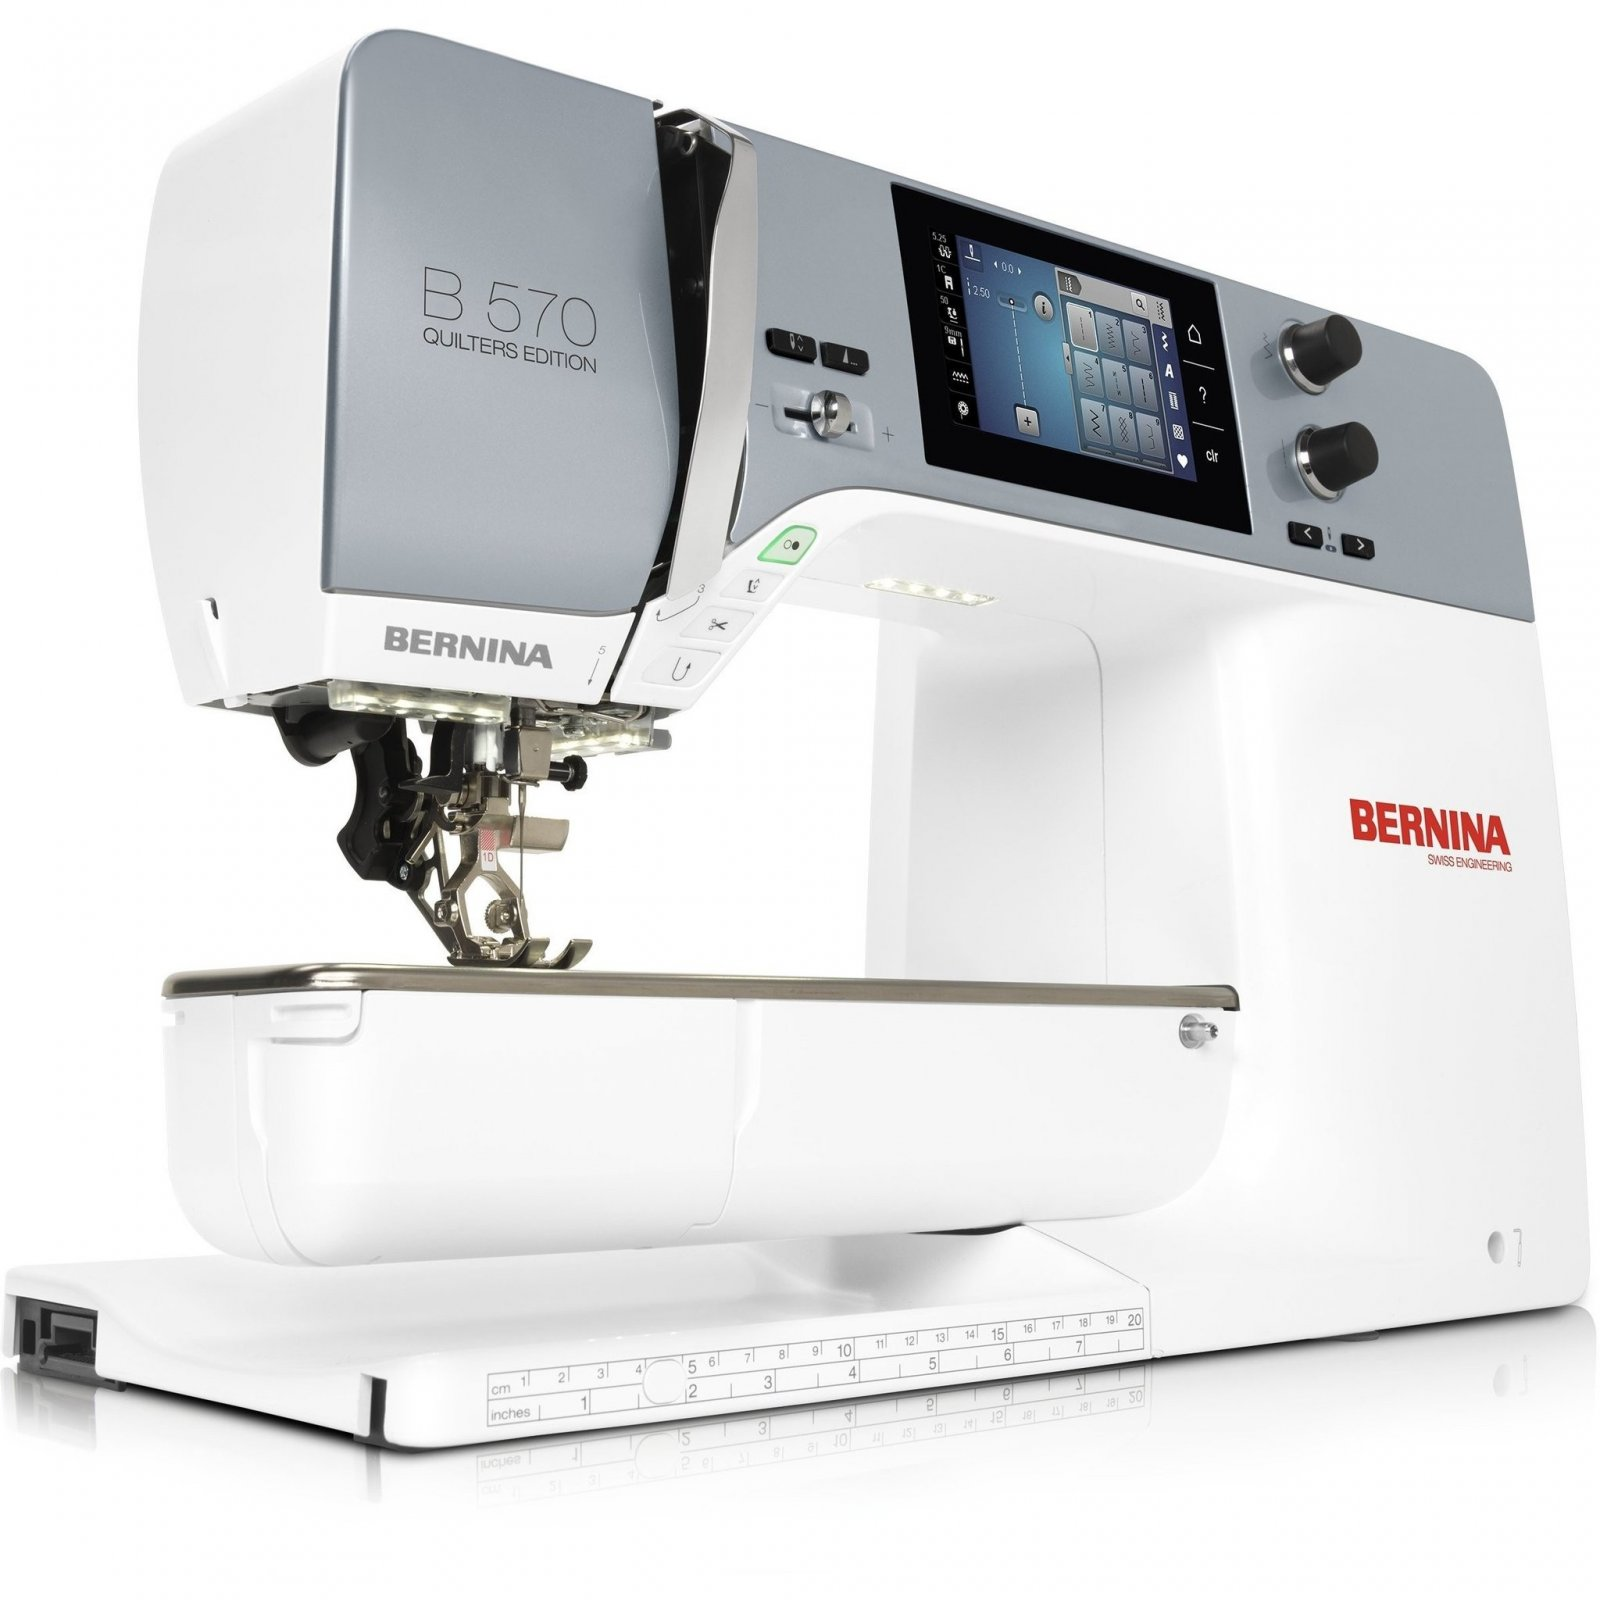 Bernina 570QE, machine only